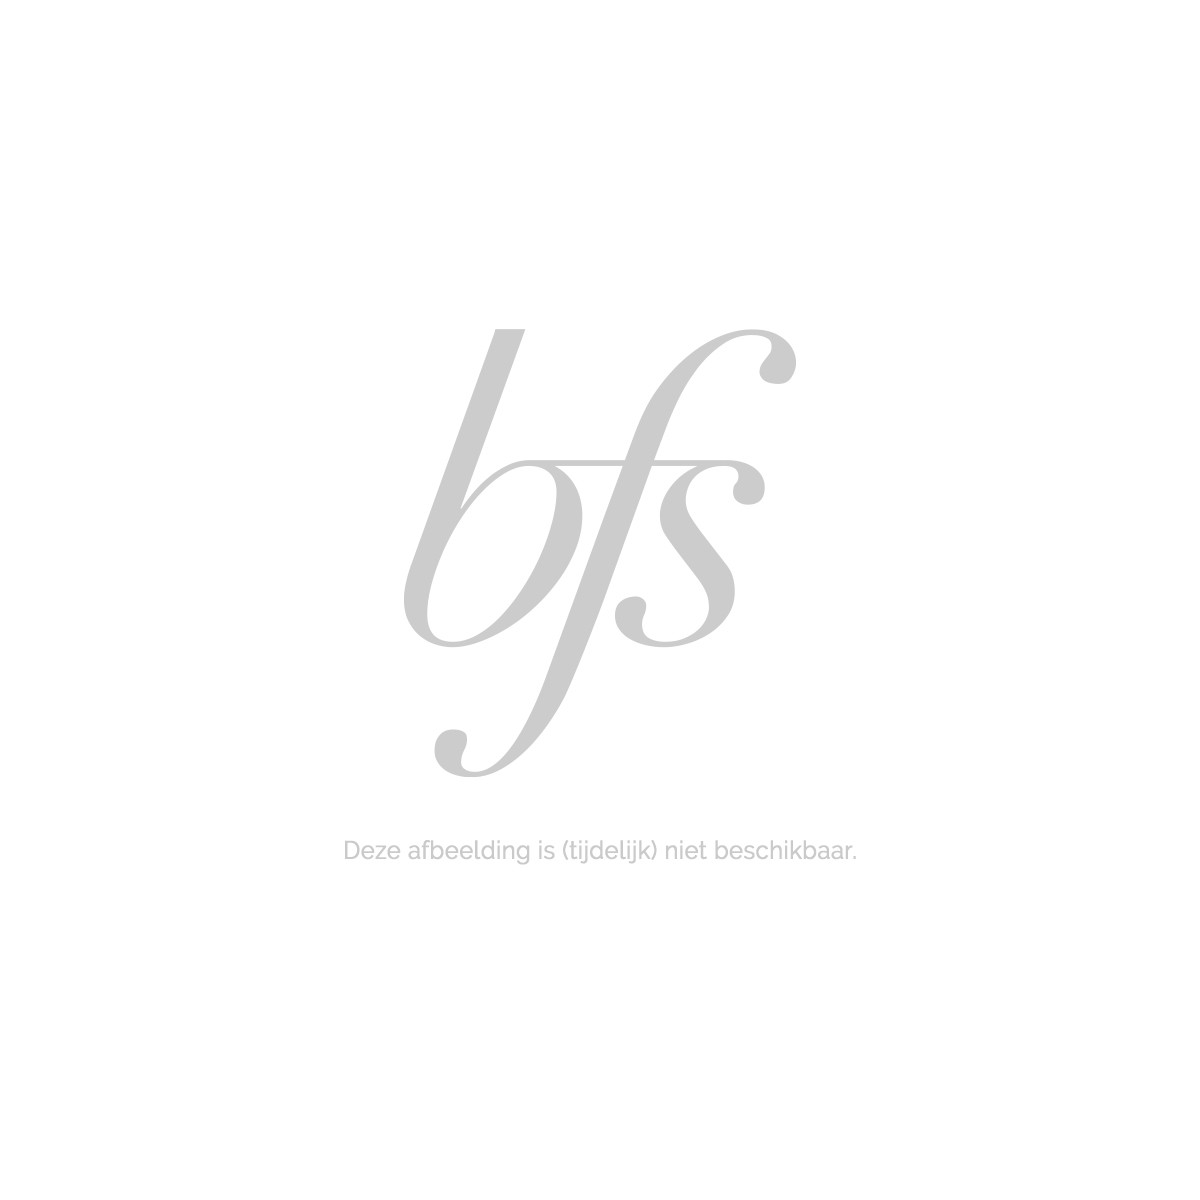 Banila Hello Sunny Essence Sun Stick Spf50+ Pa++++ Fresh